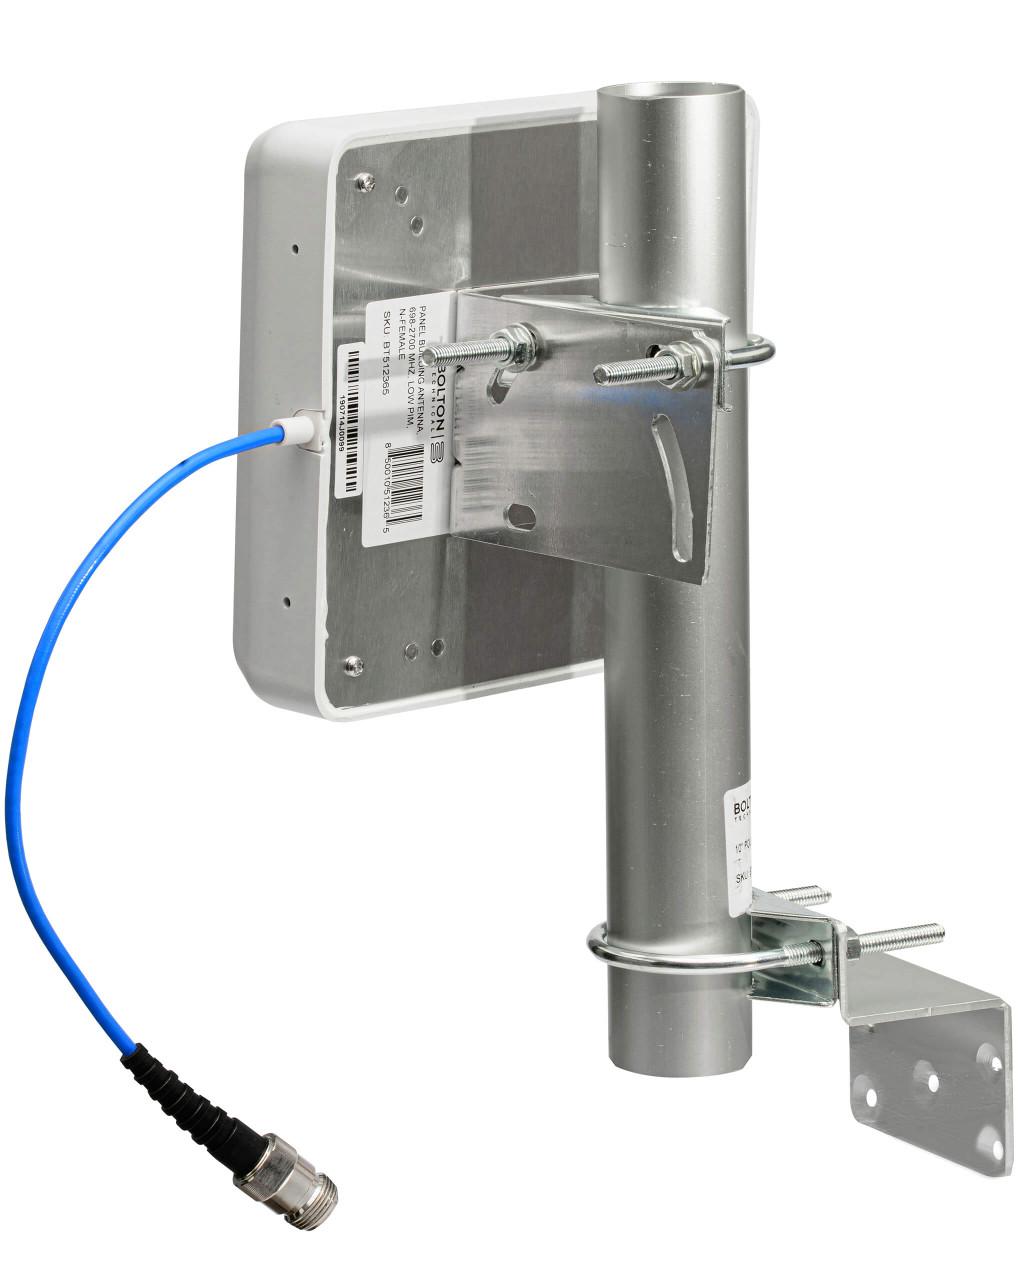 The Indoor 5G Board - Indoor Wall Mount Antenna mounting